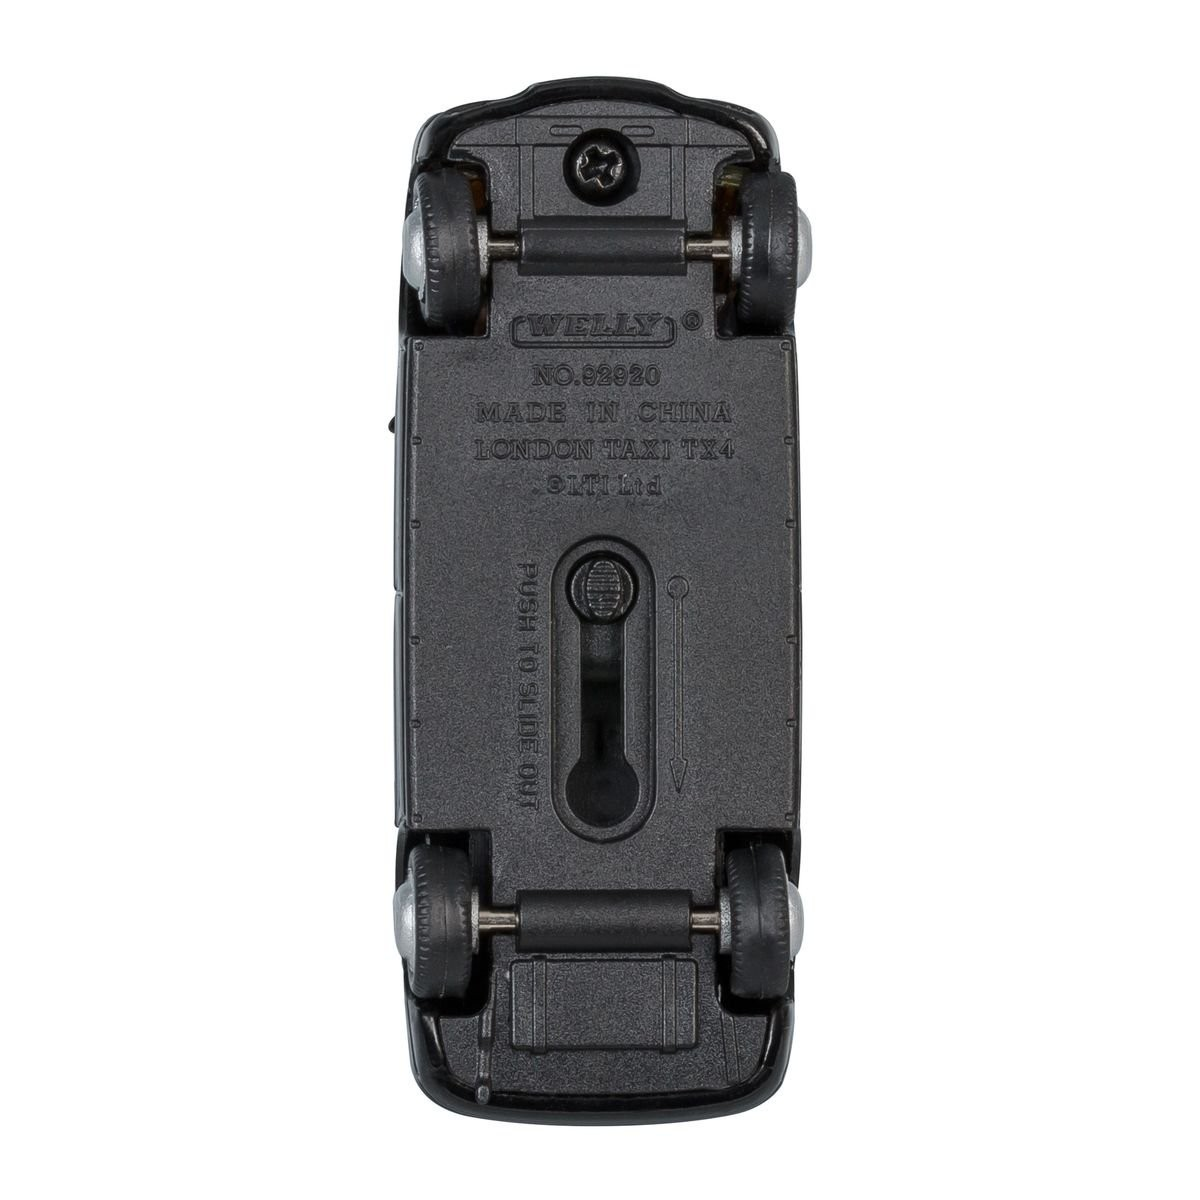 USB-Speicherstick London Taxi TX4 1:72 BLACK 16GB, Ansicht 13